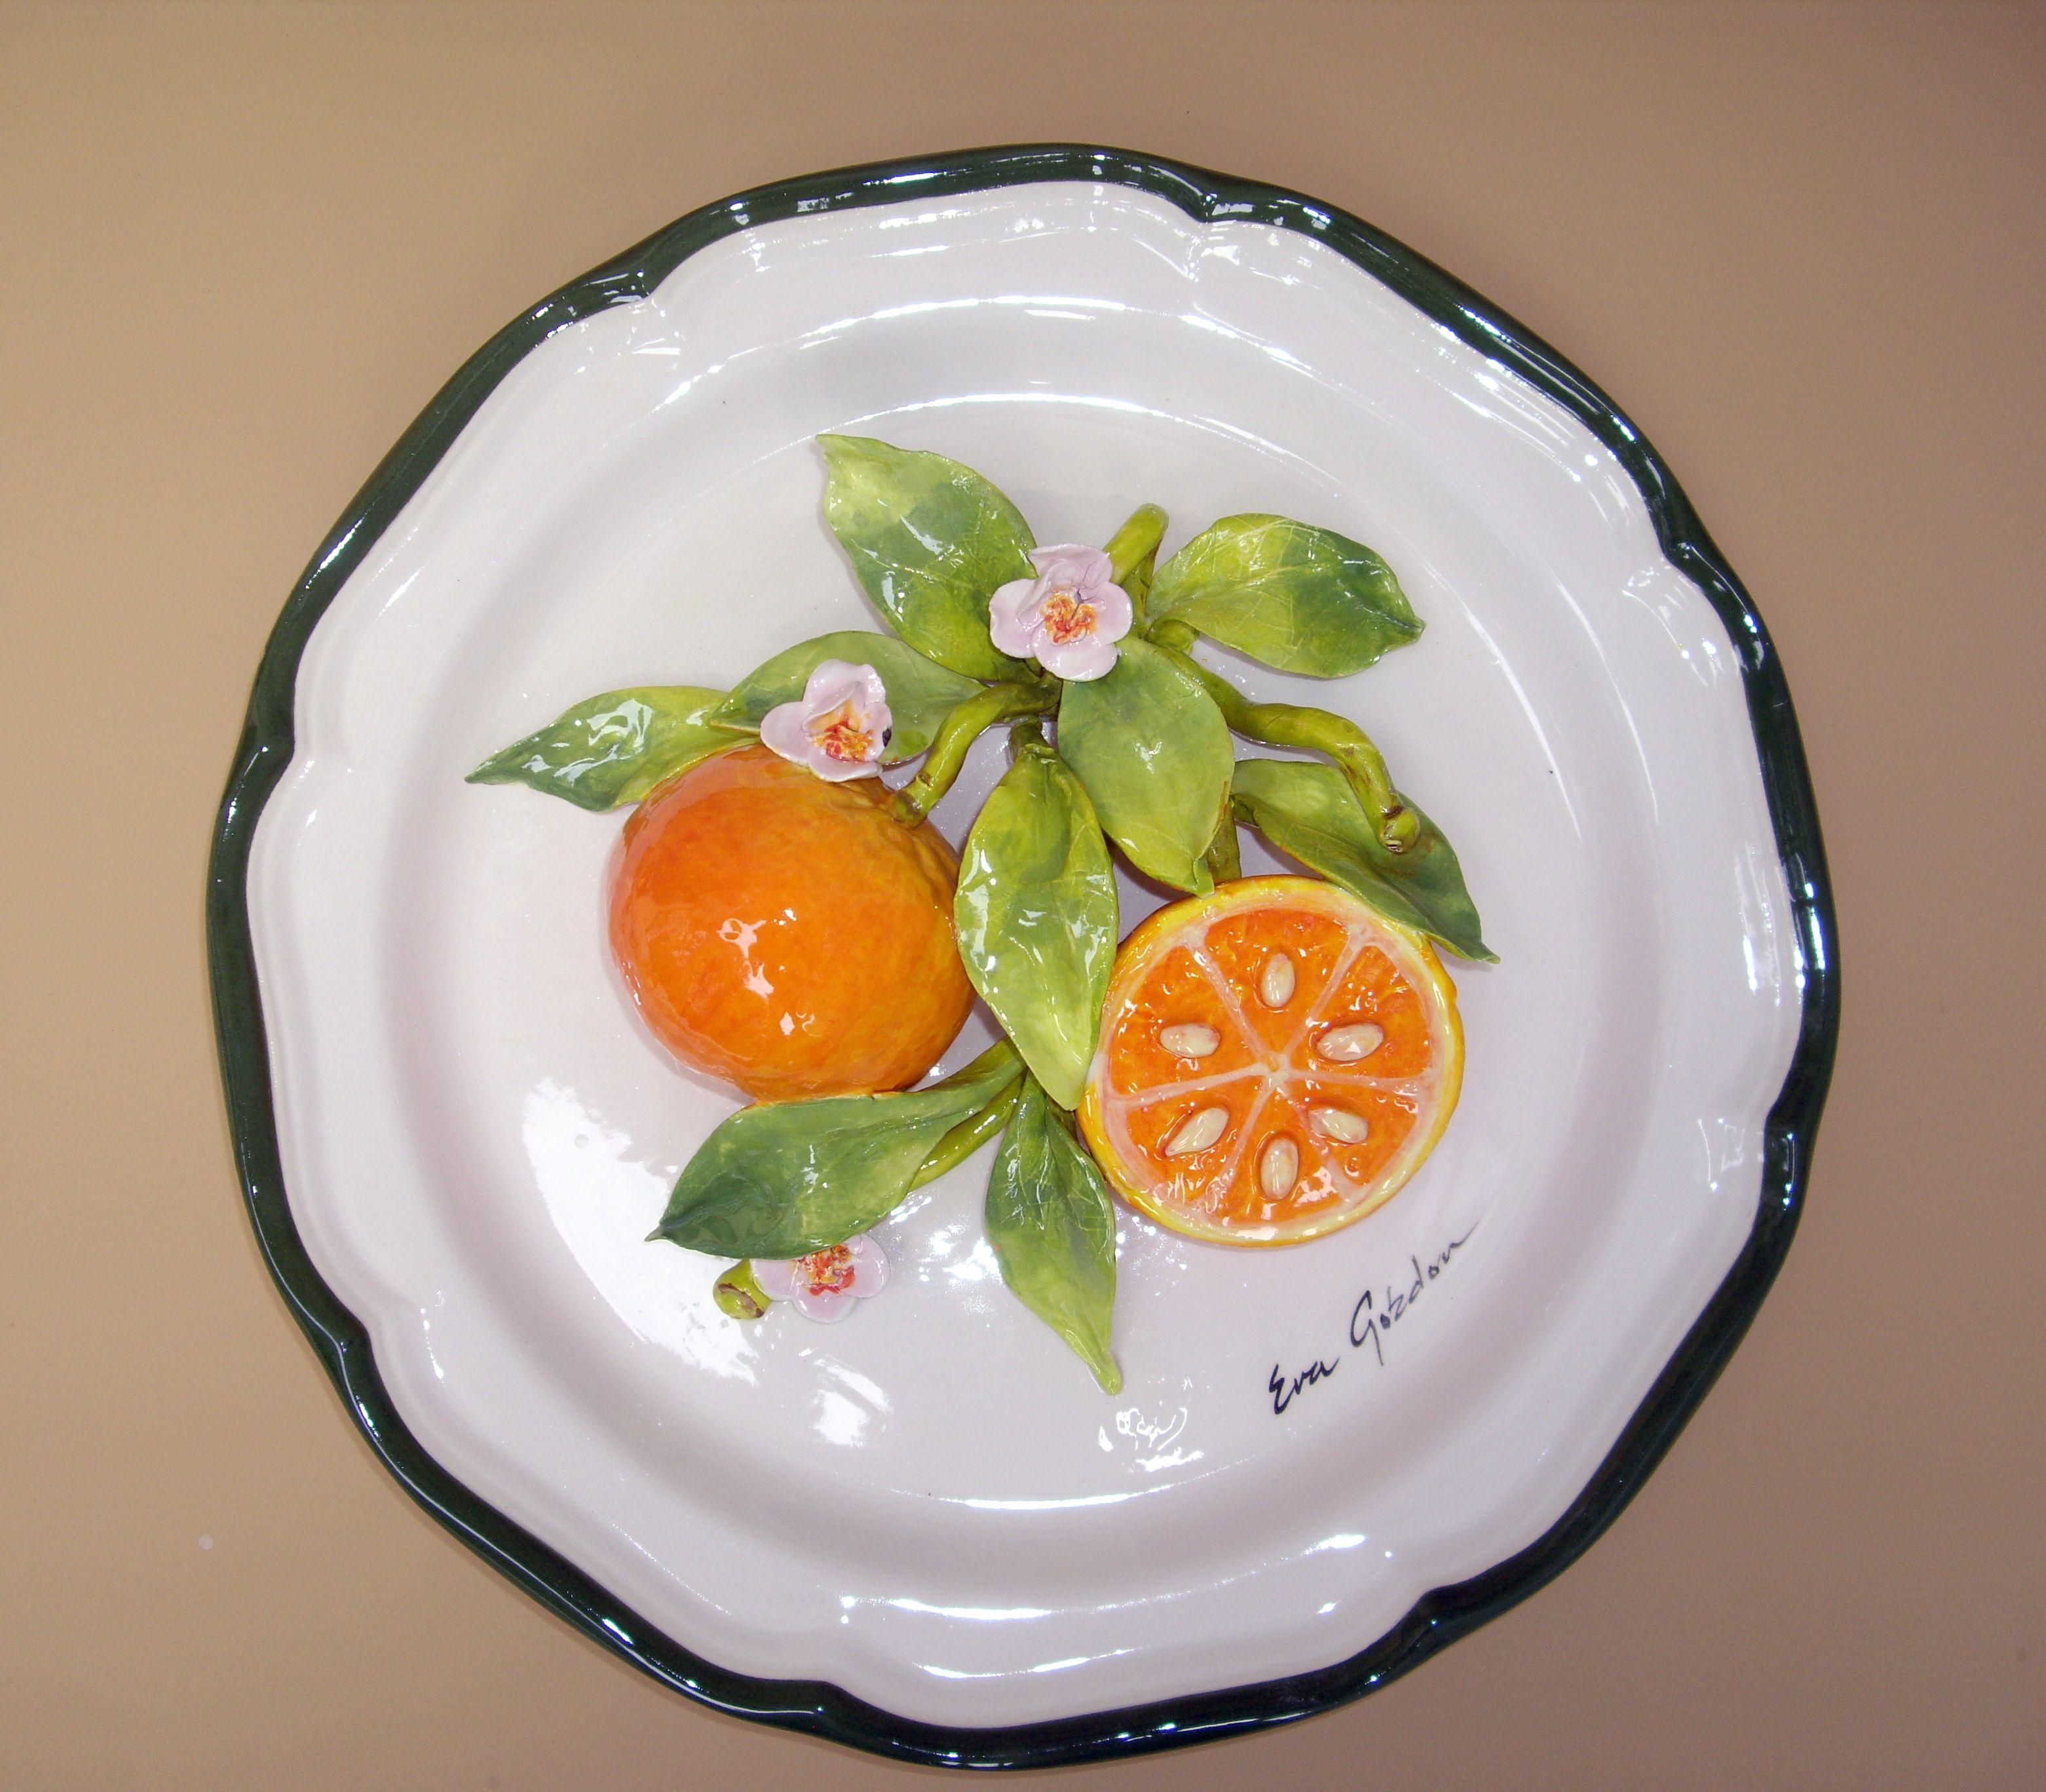 Elements For Good Living Protocol Gifts Ceramic Decor Porcelain Flowers Lemon Kitchen